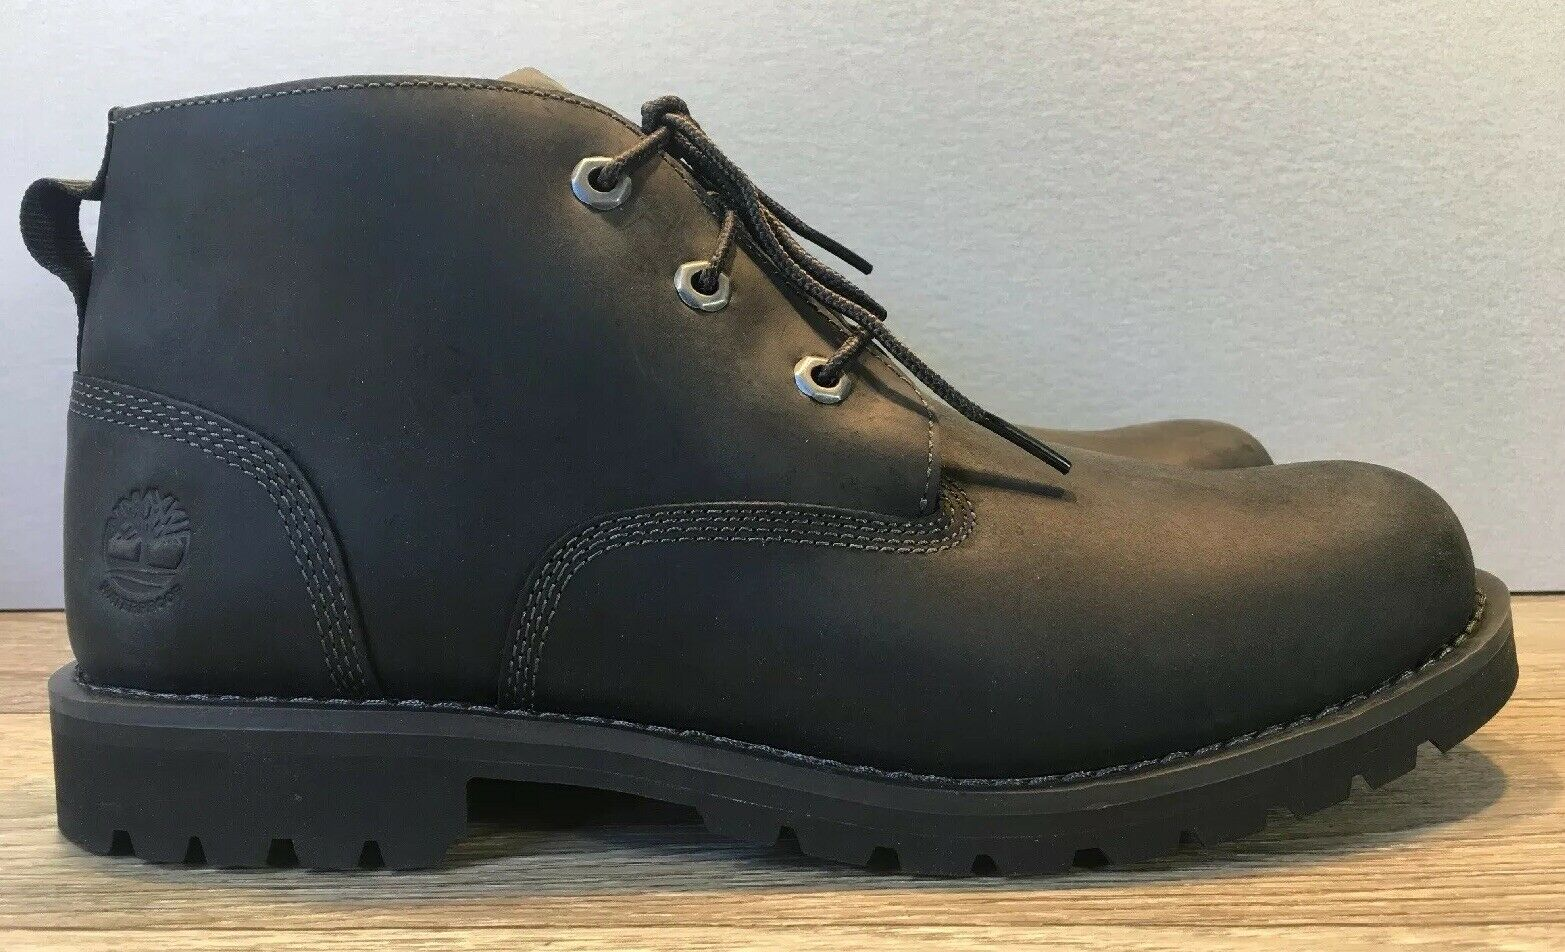 NEW Timberland Men's Larchmont Black Full Grain Leather Chukka Boots A11E1 SZ13